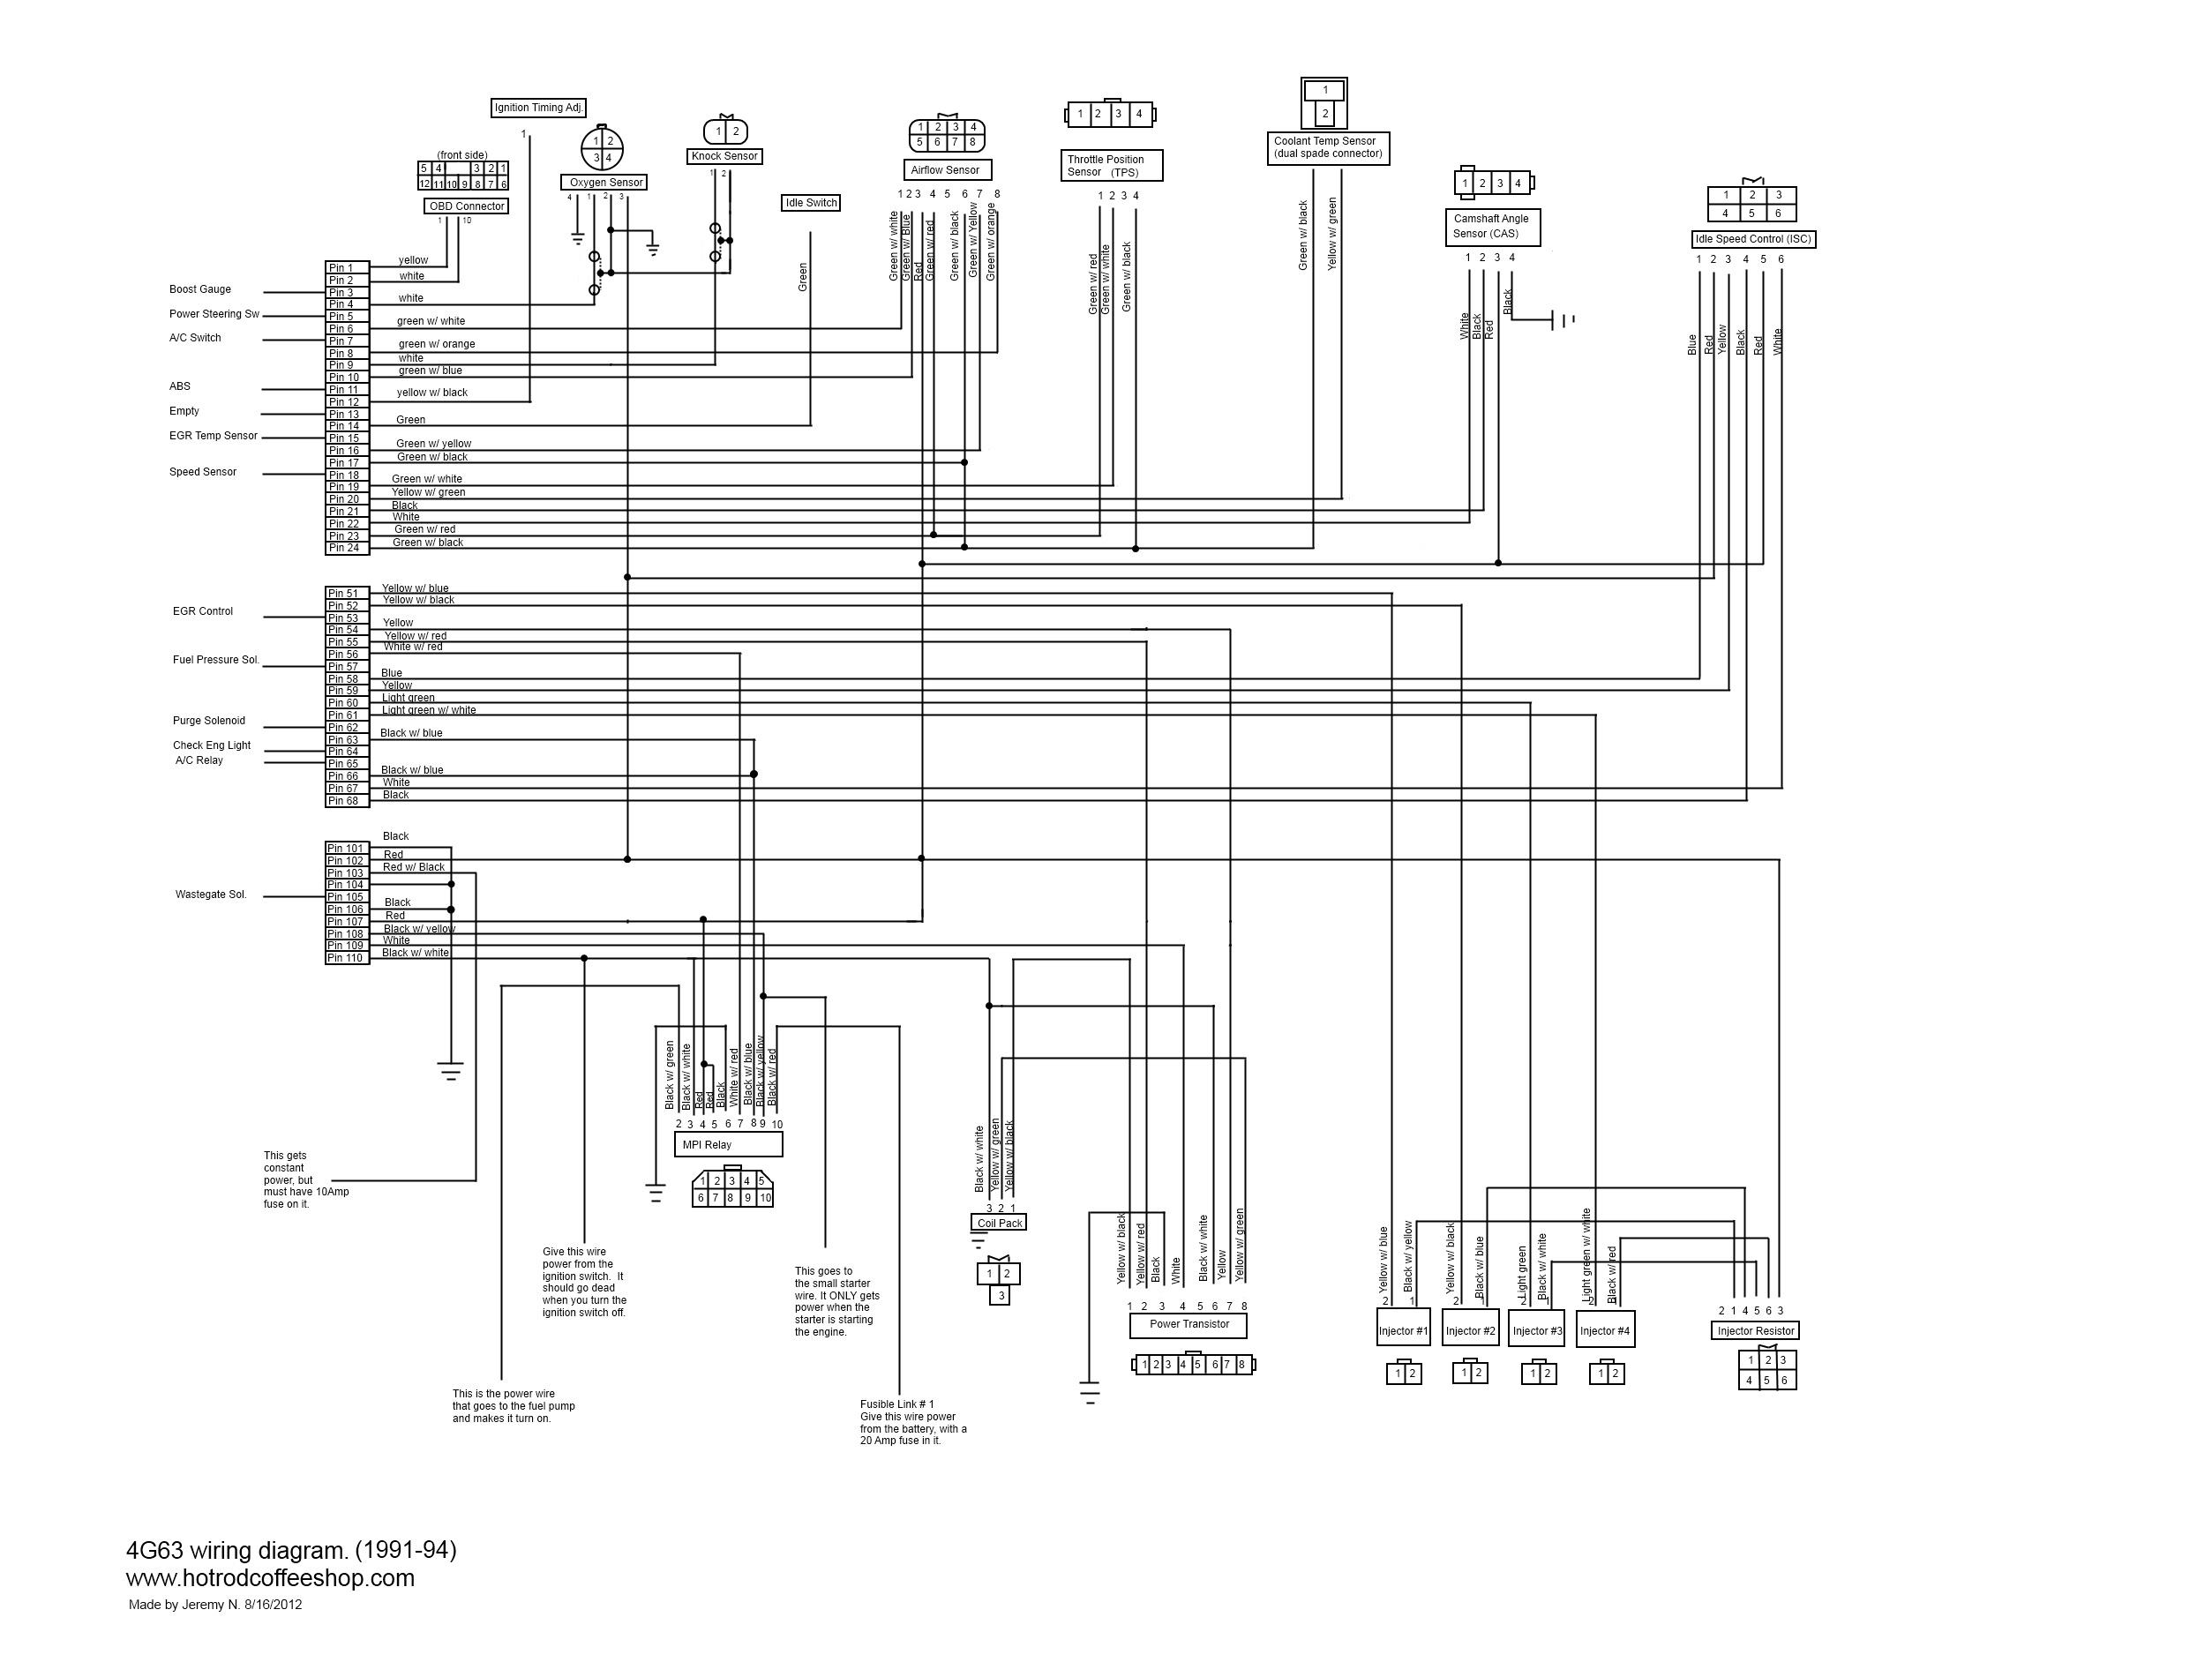 4g63 alternator wiring diagram